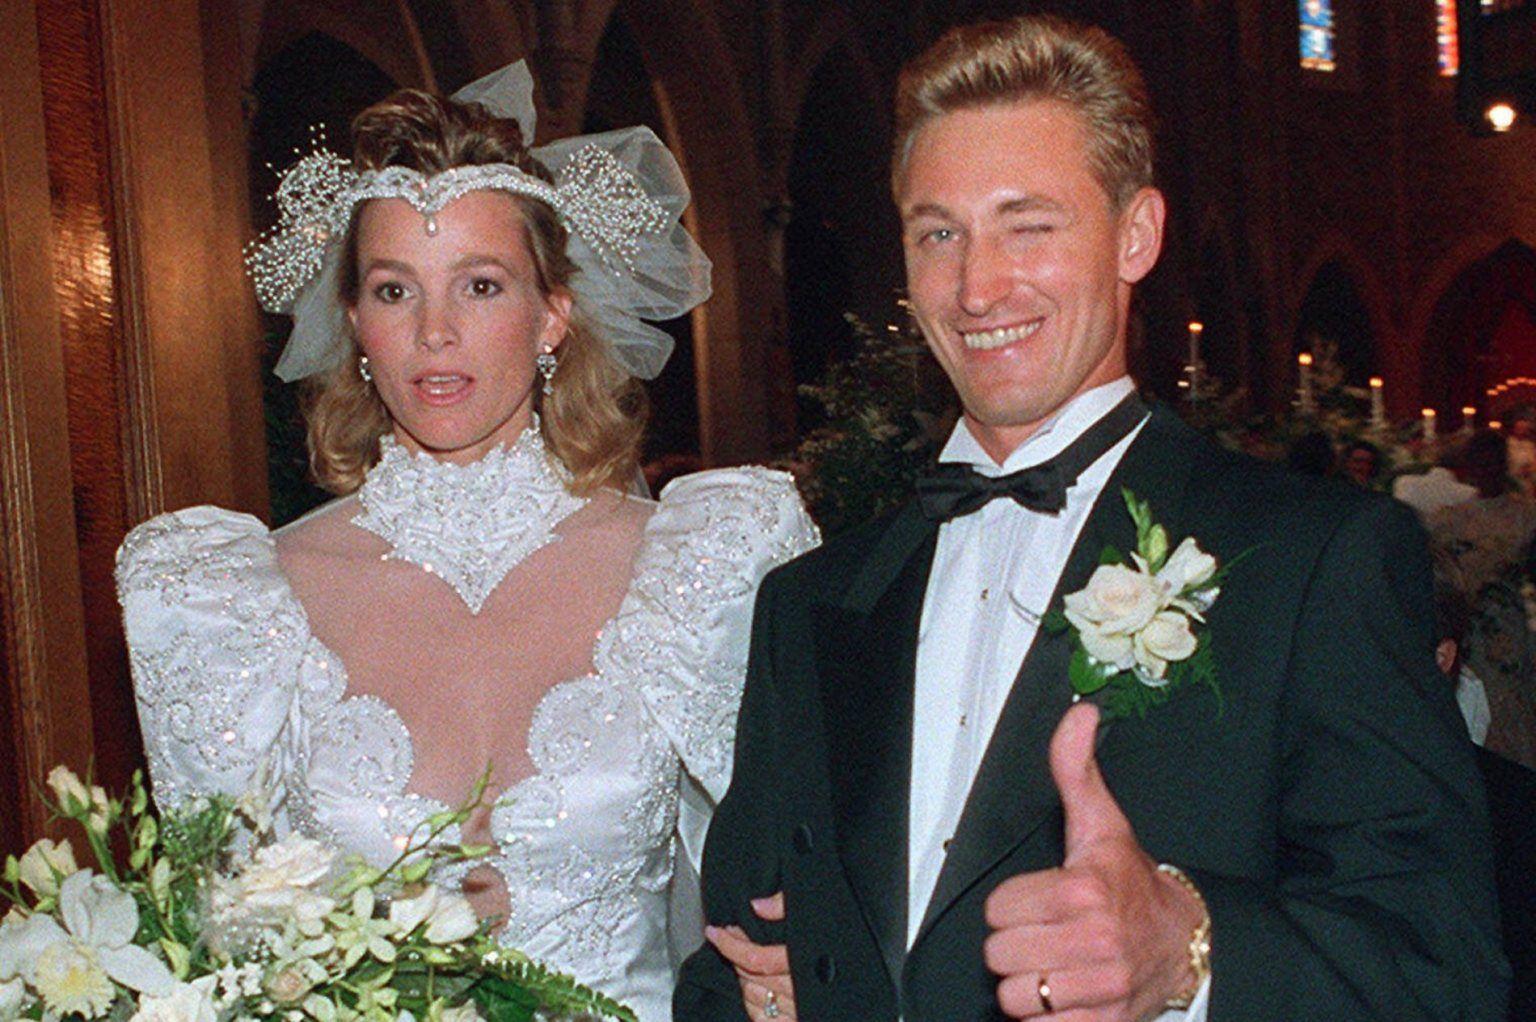 Gretzky, July 16, 1988   Celebrity wedding photos, Hollywood wedding ...